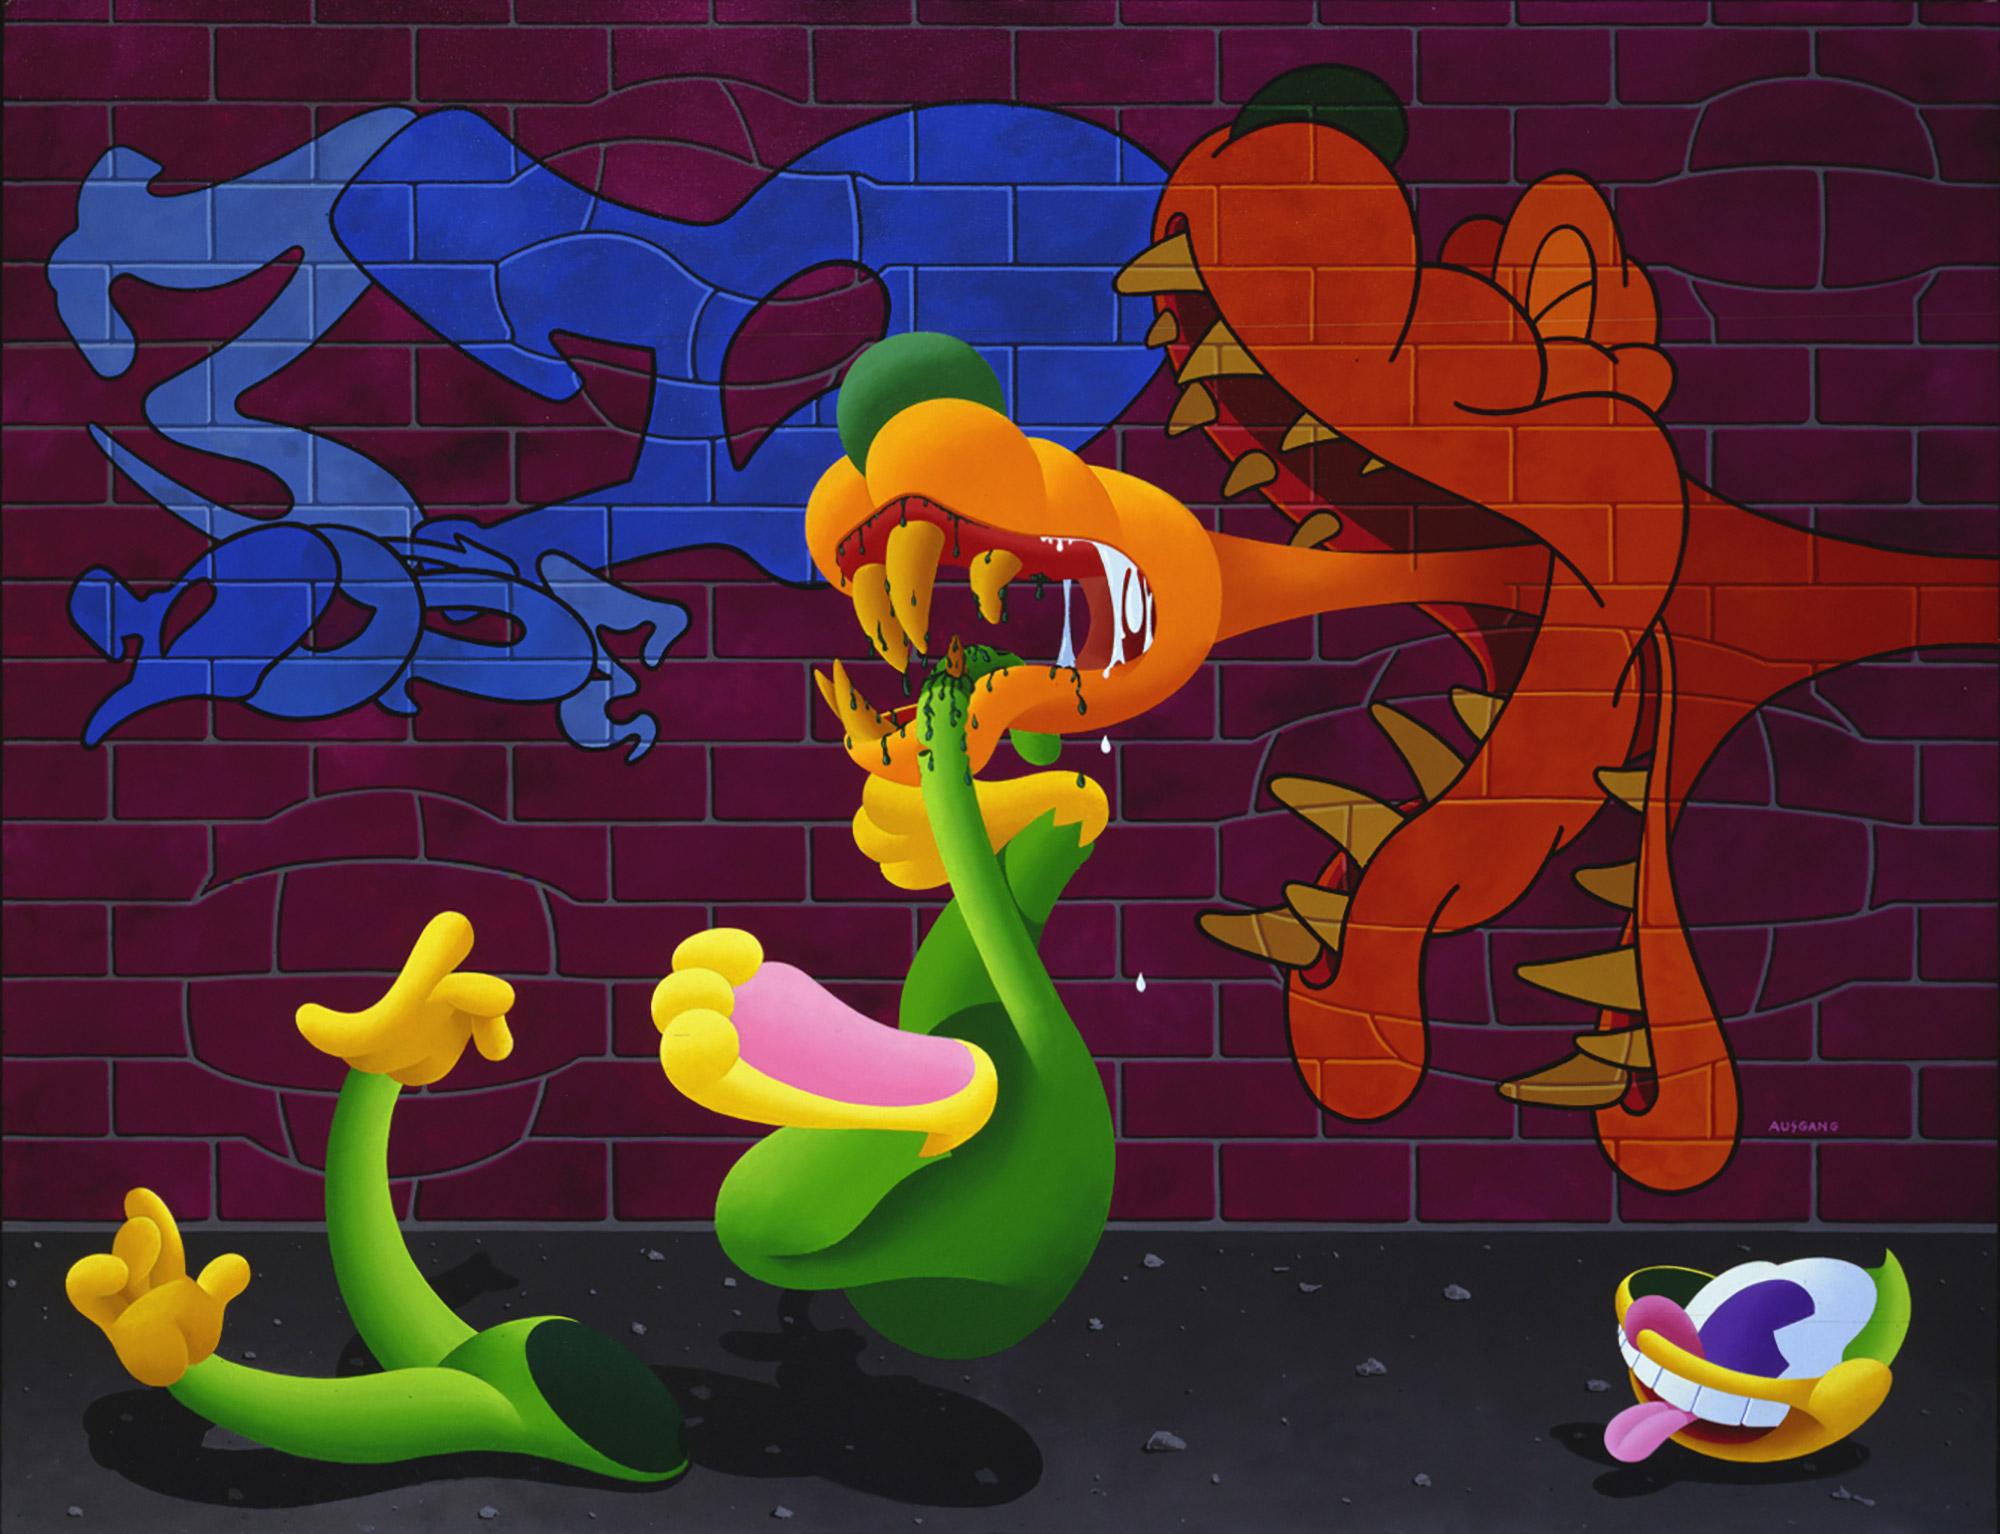 3D Dose, 1997